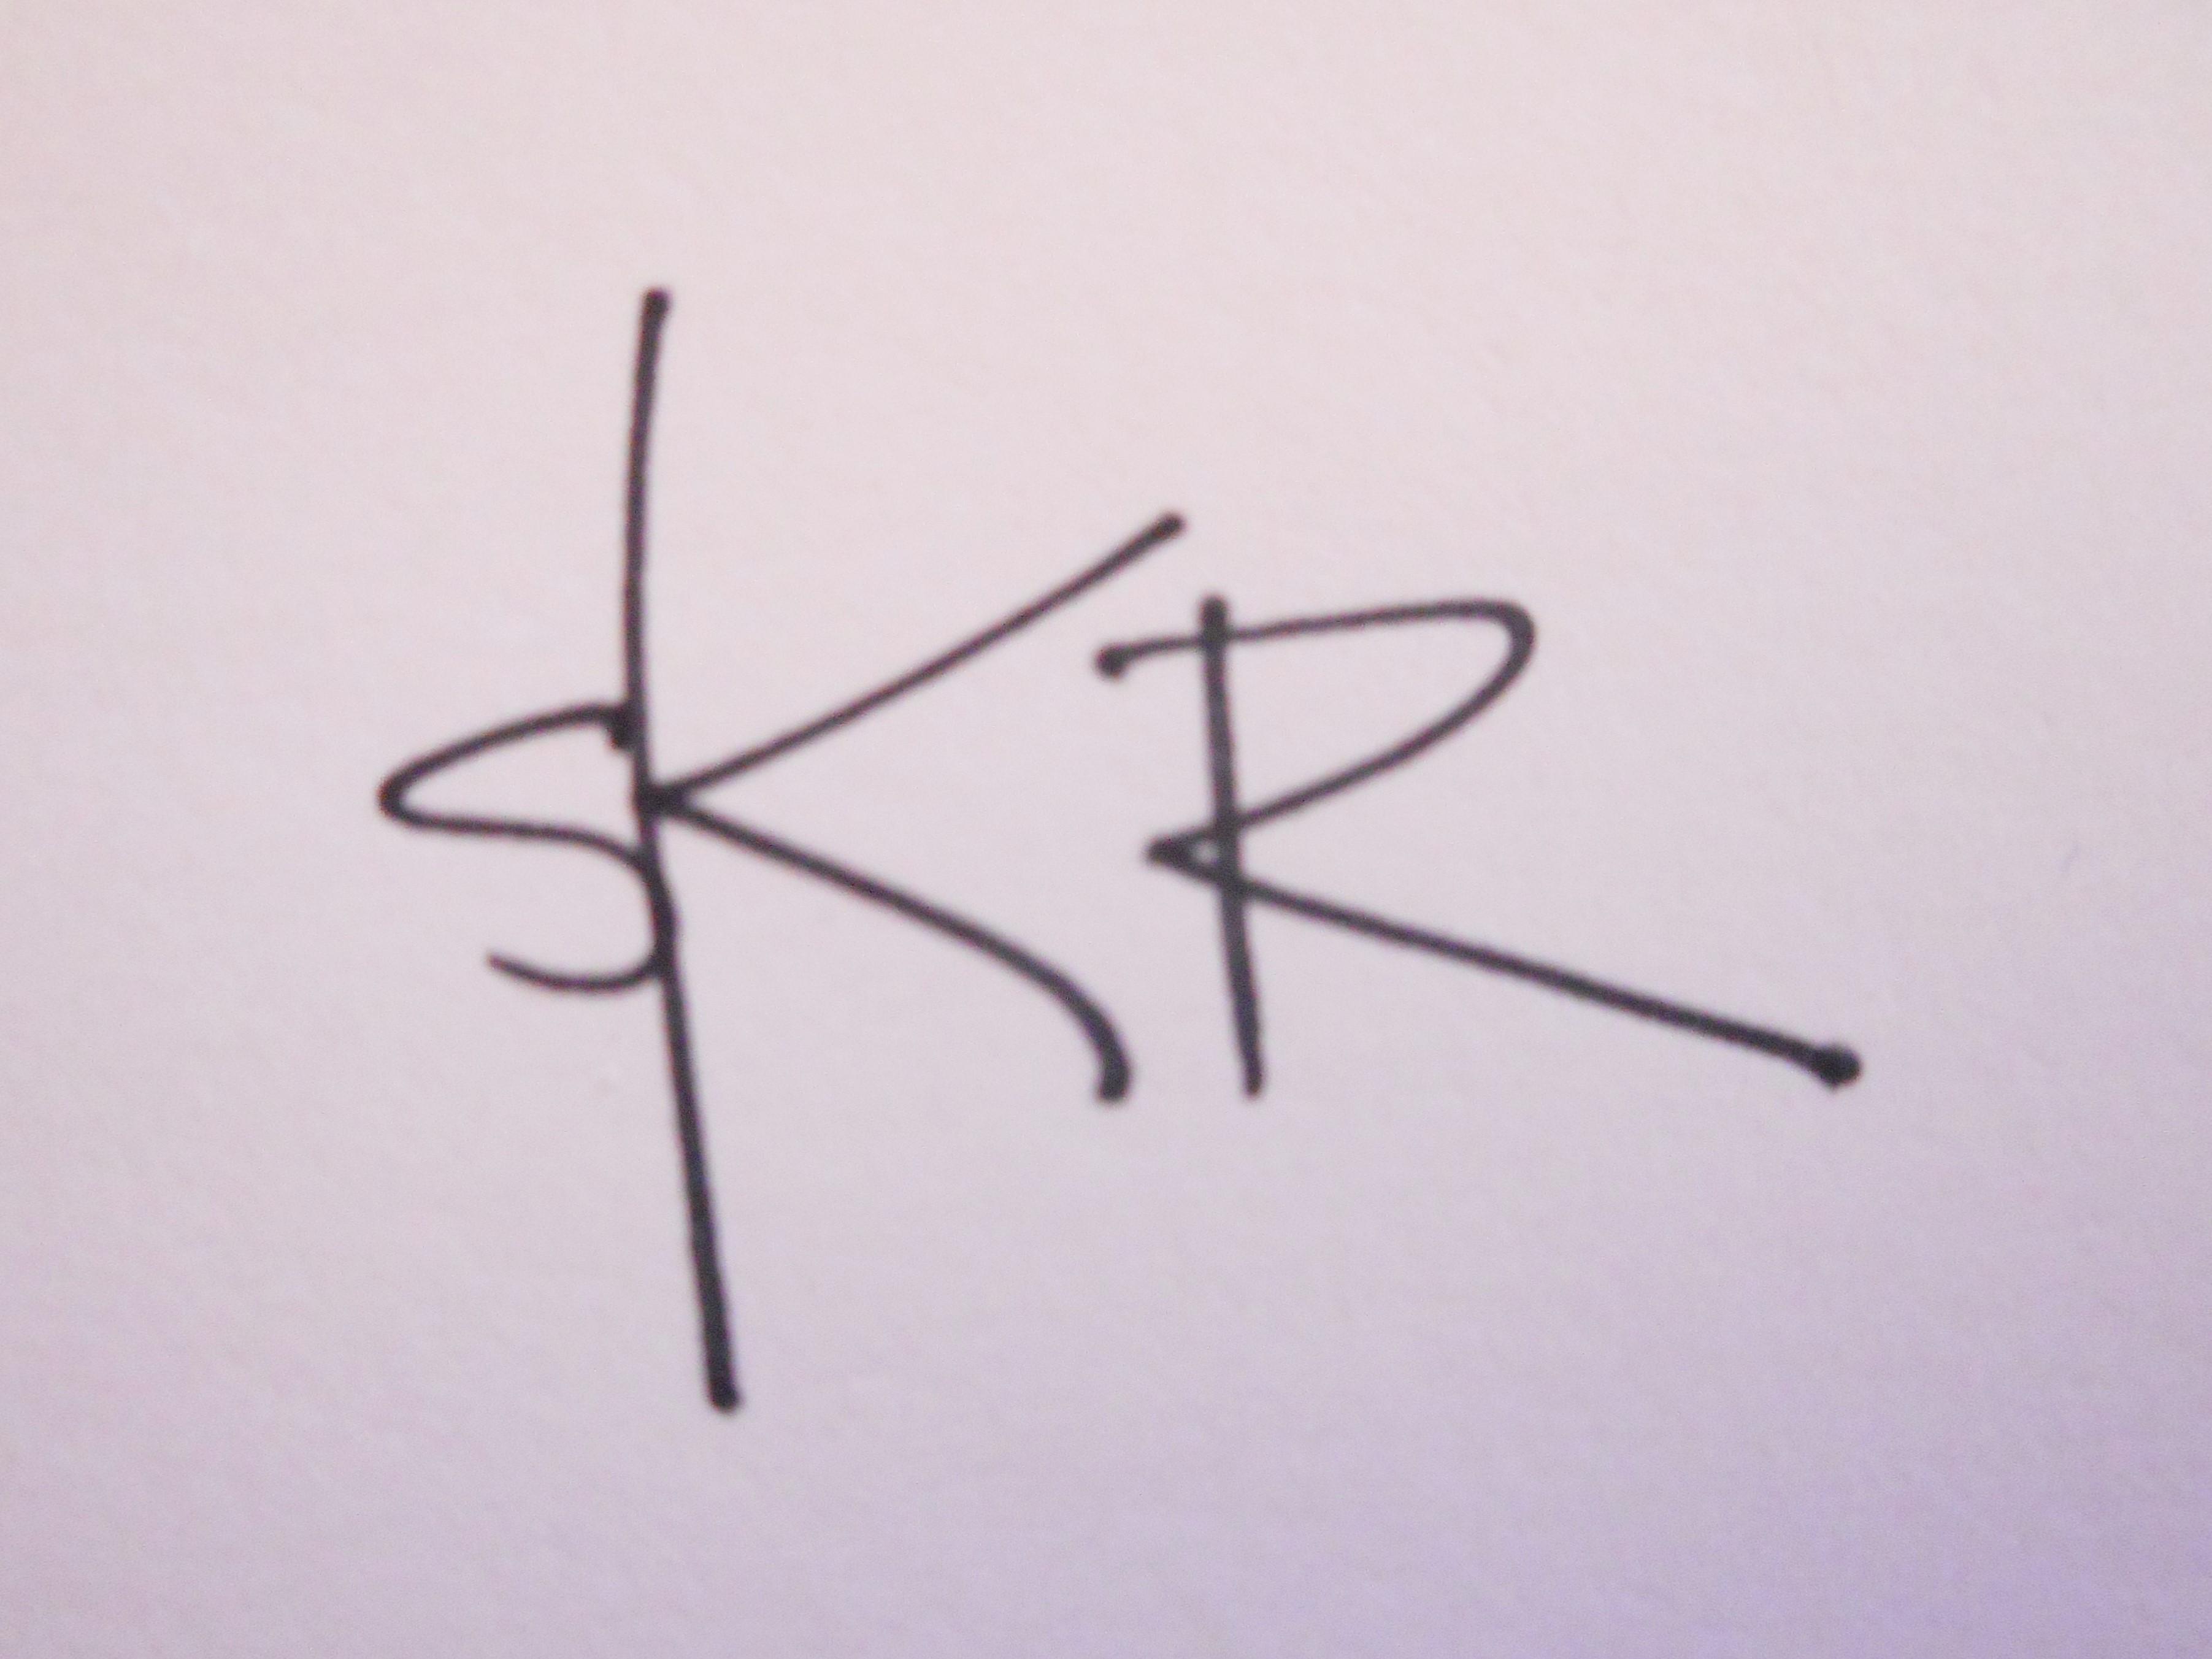 Suzette Krummel's Signature